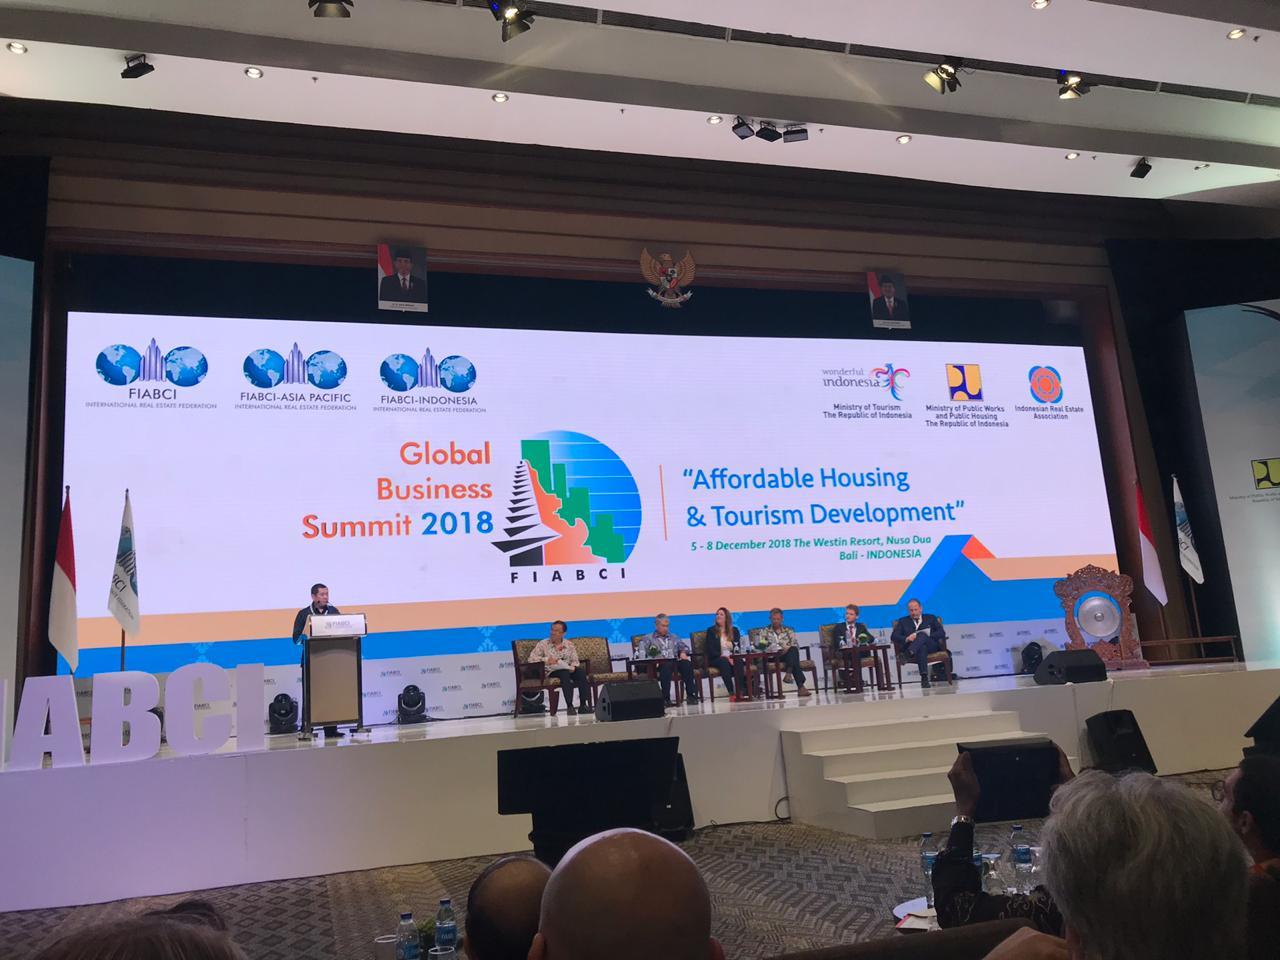 https: img-z.okeinfo.net content 2018 12 08 470 1988451 fiabci-summit-pertama-digelar-di-indonesia-rei-tawarkan-investasi-rp68-triliun-9y63ztLH0C.jpg